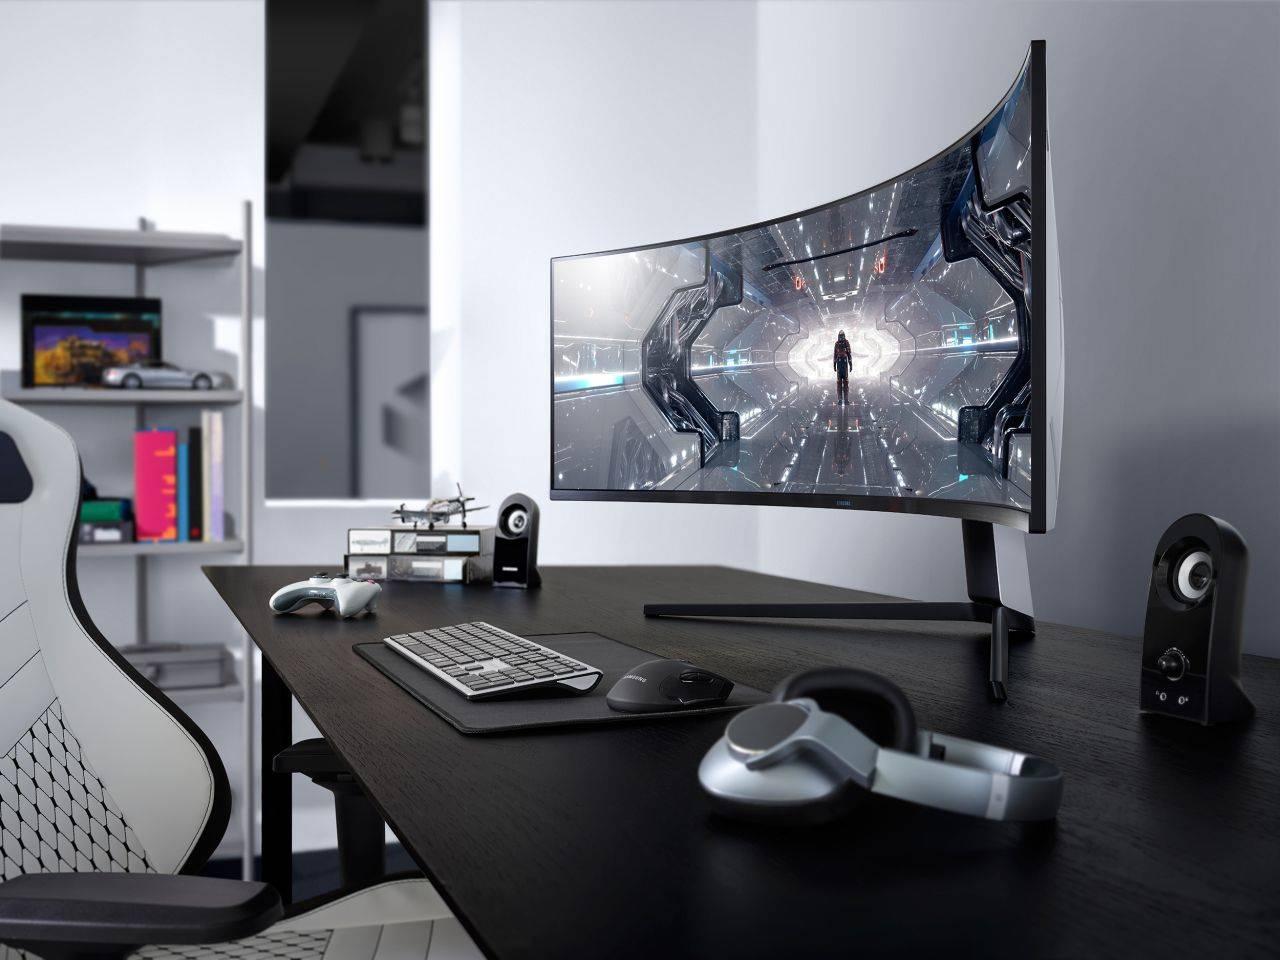 Samsung Odyssey G9 G7 CES 2020